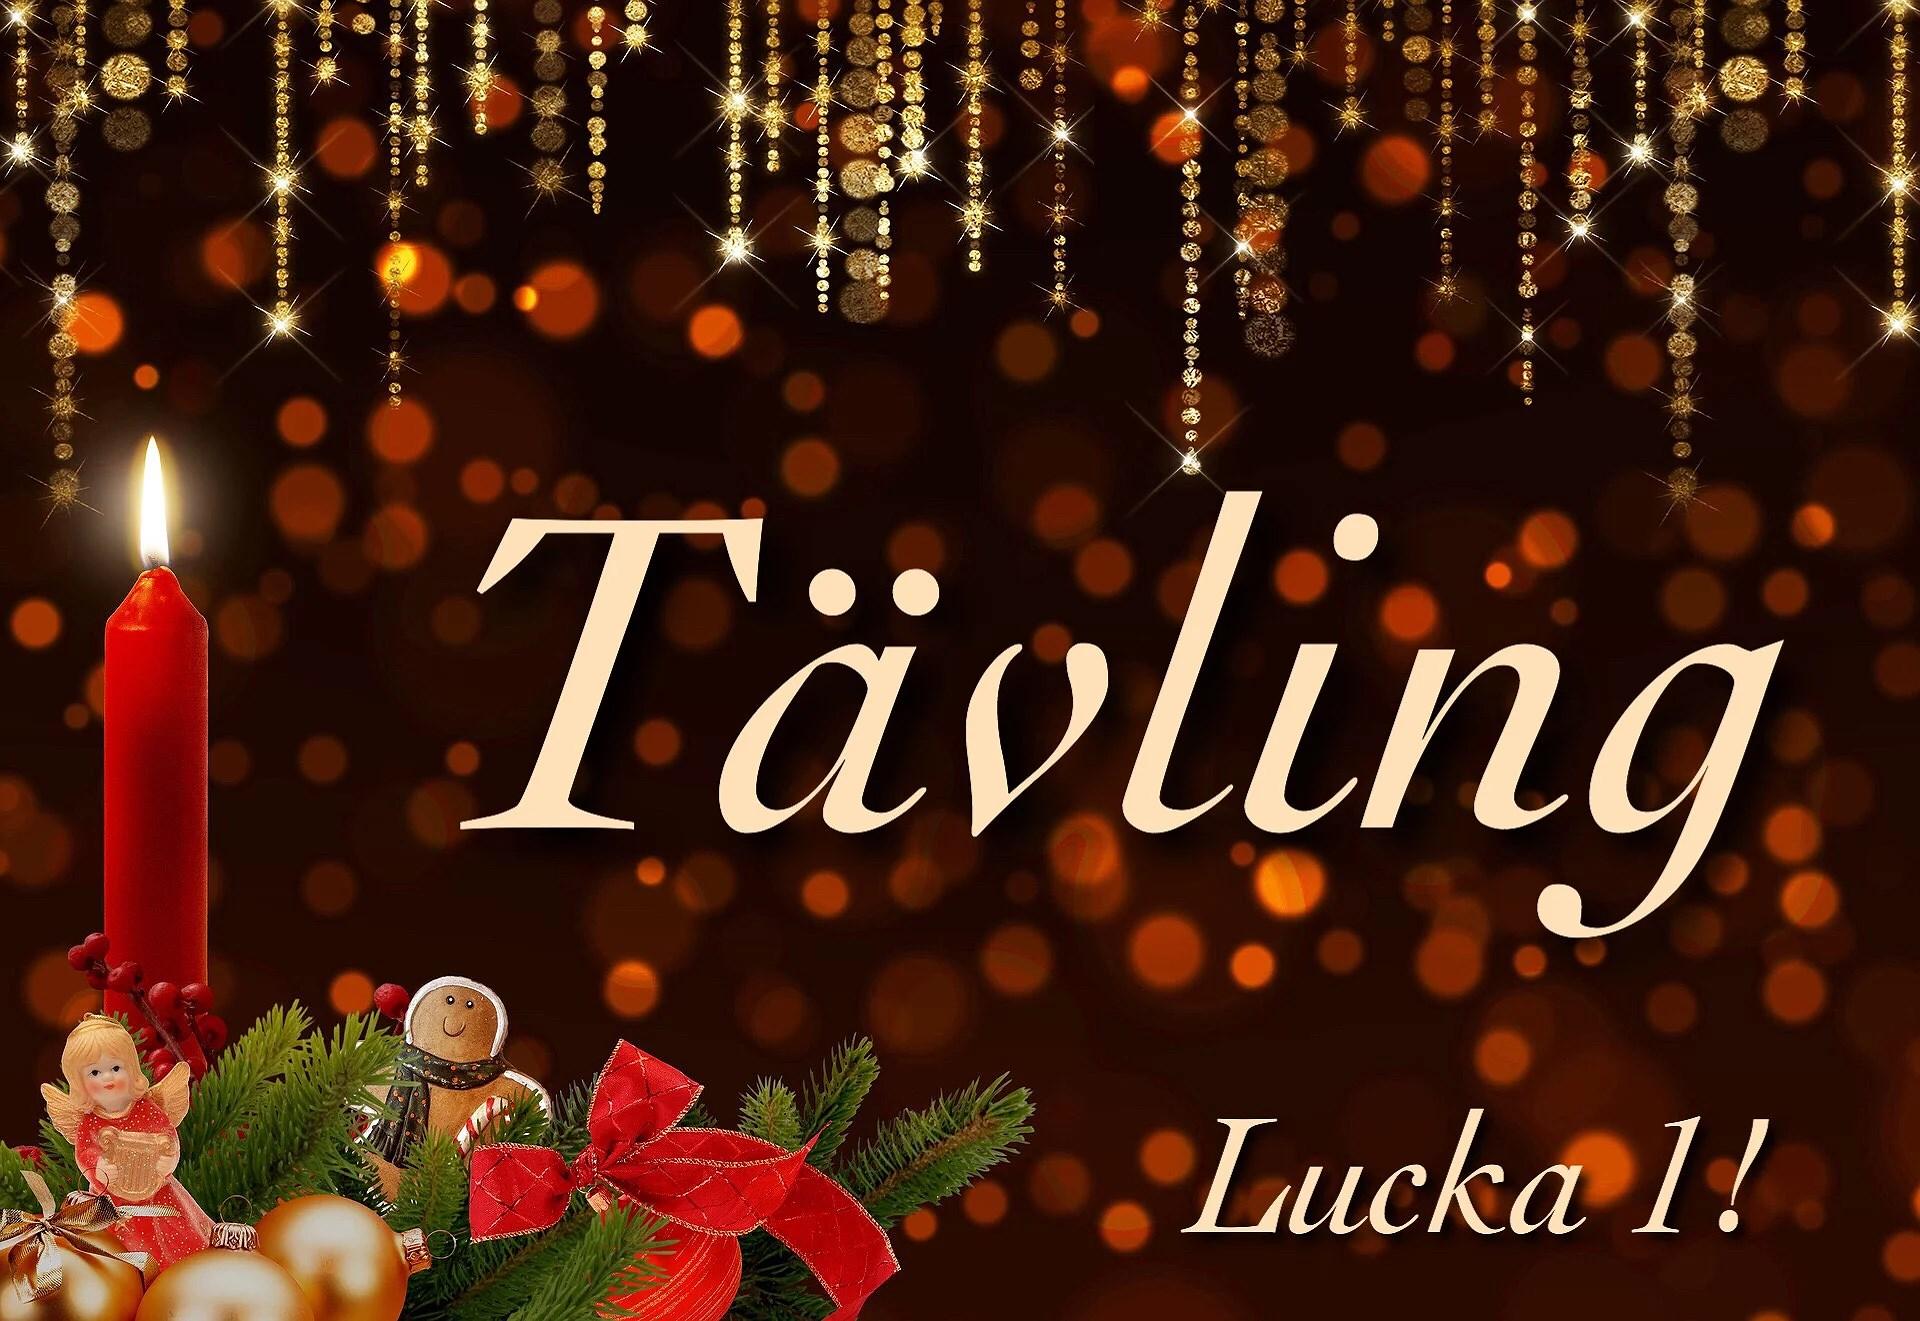 1:a advent - Lucka 1!